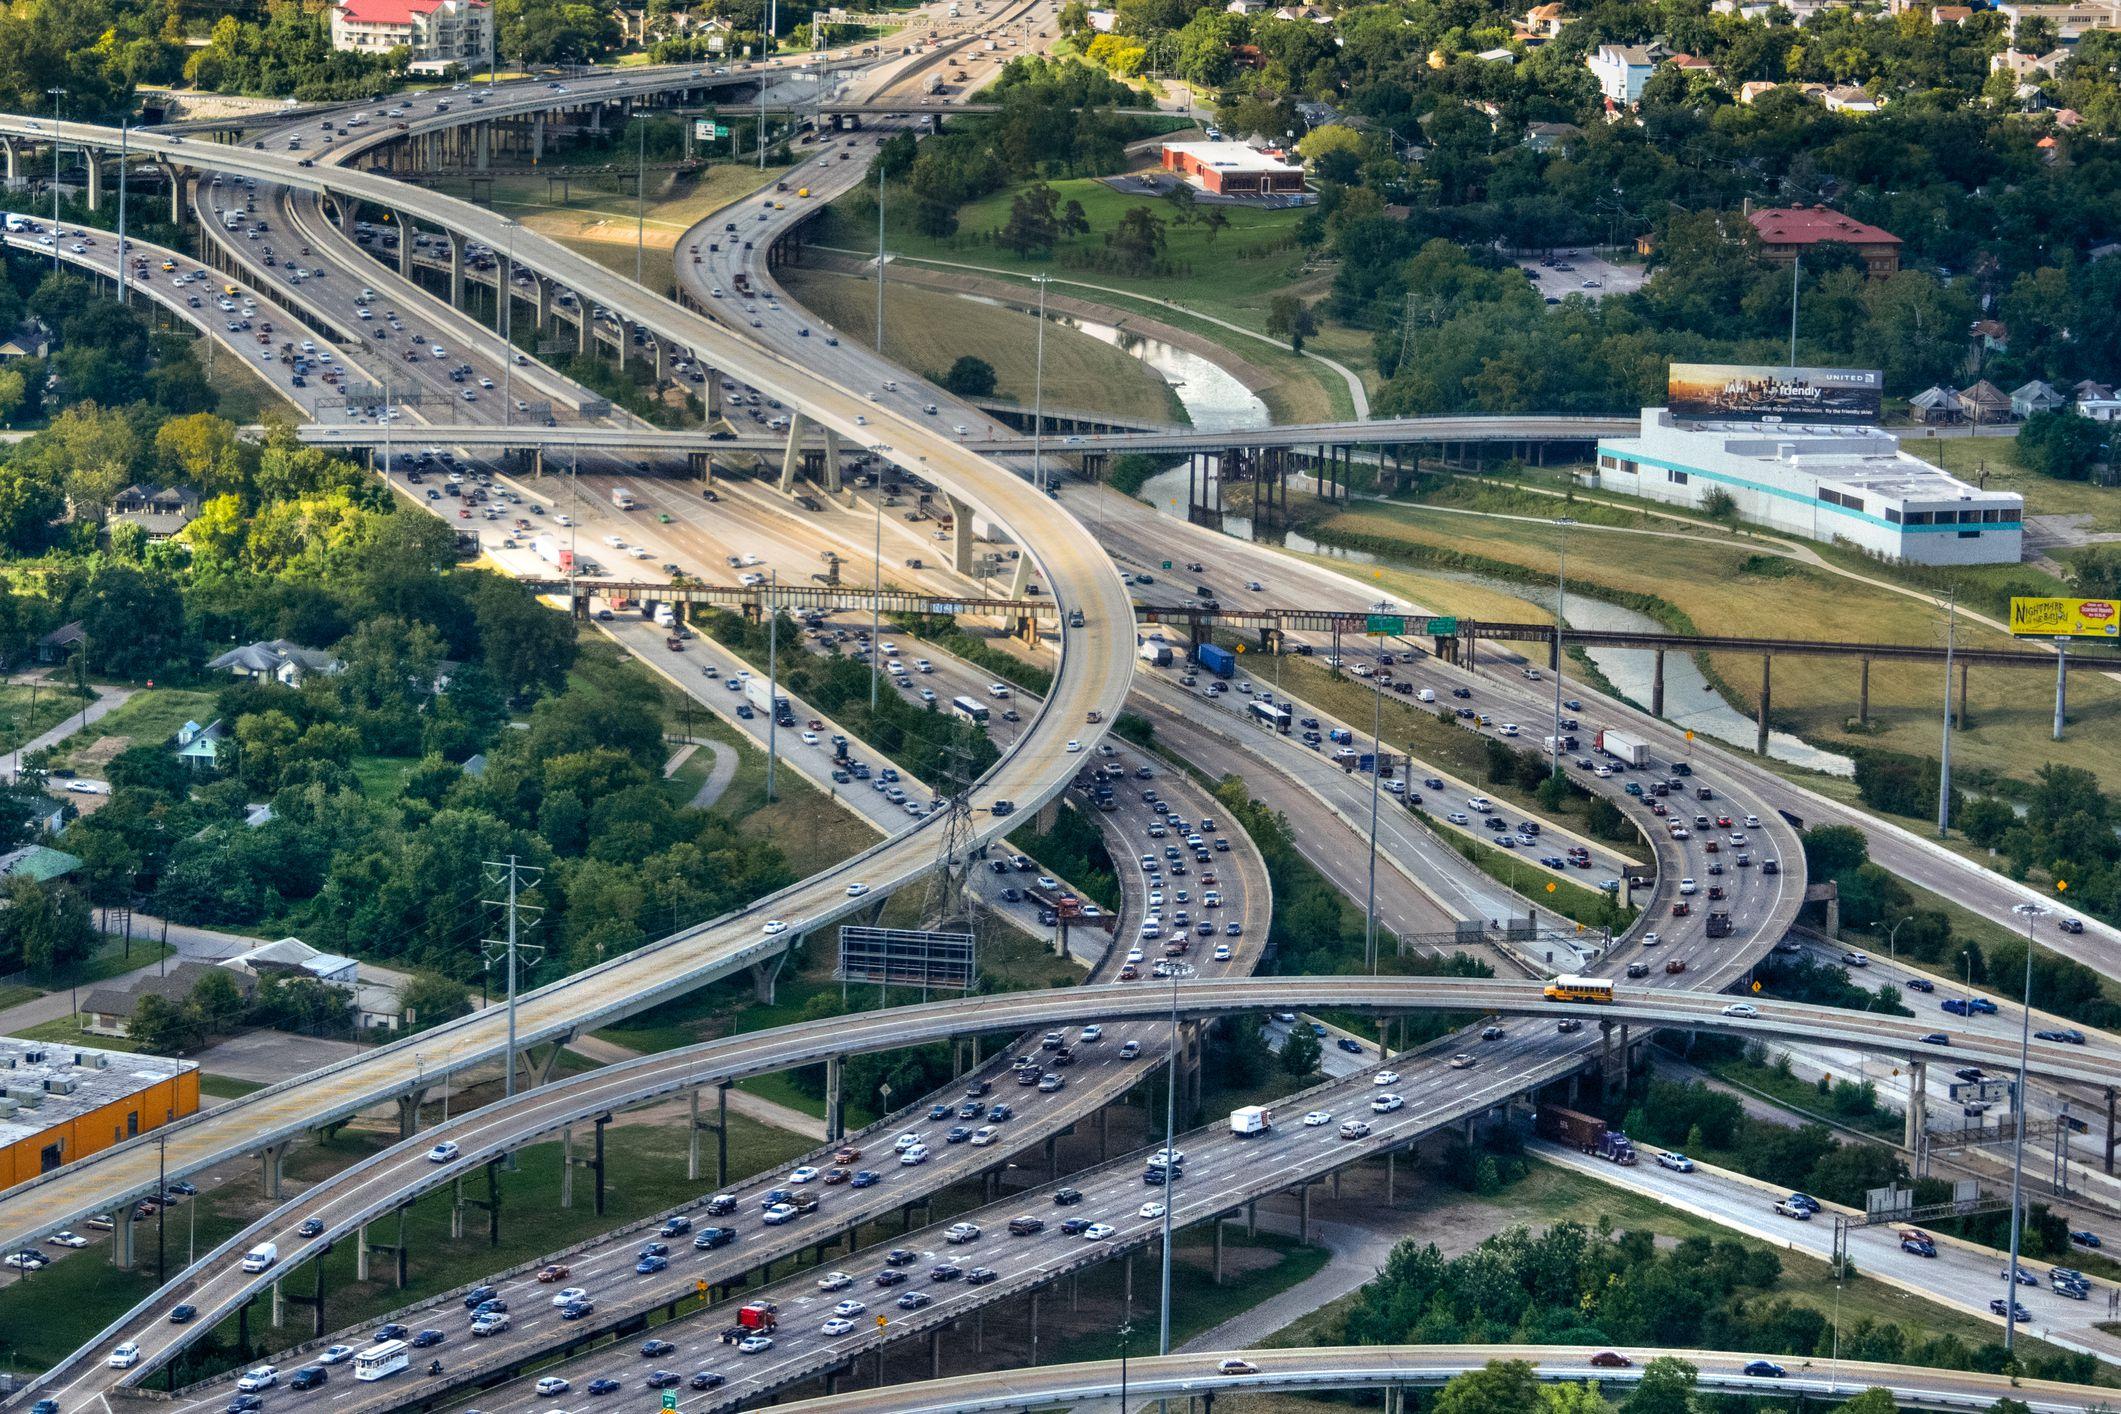 Rose on Twitter: Toronto, Highway 401: Widest highway in